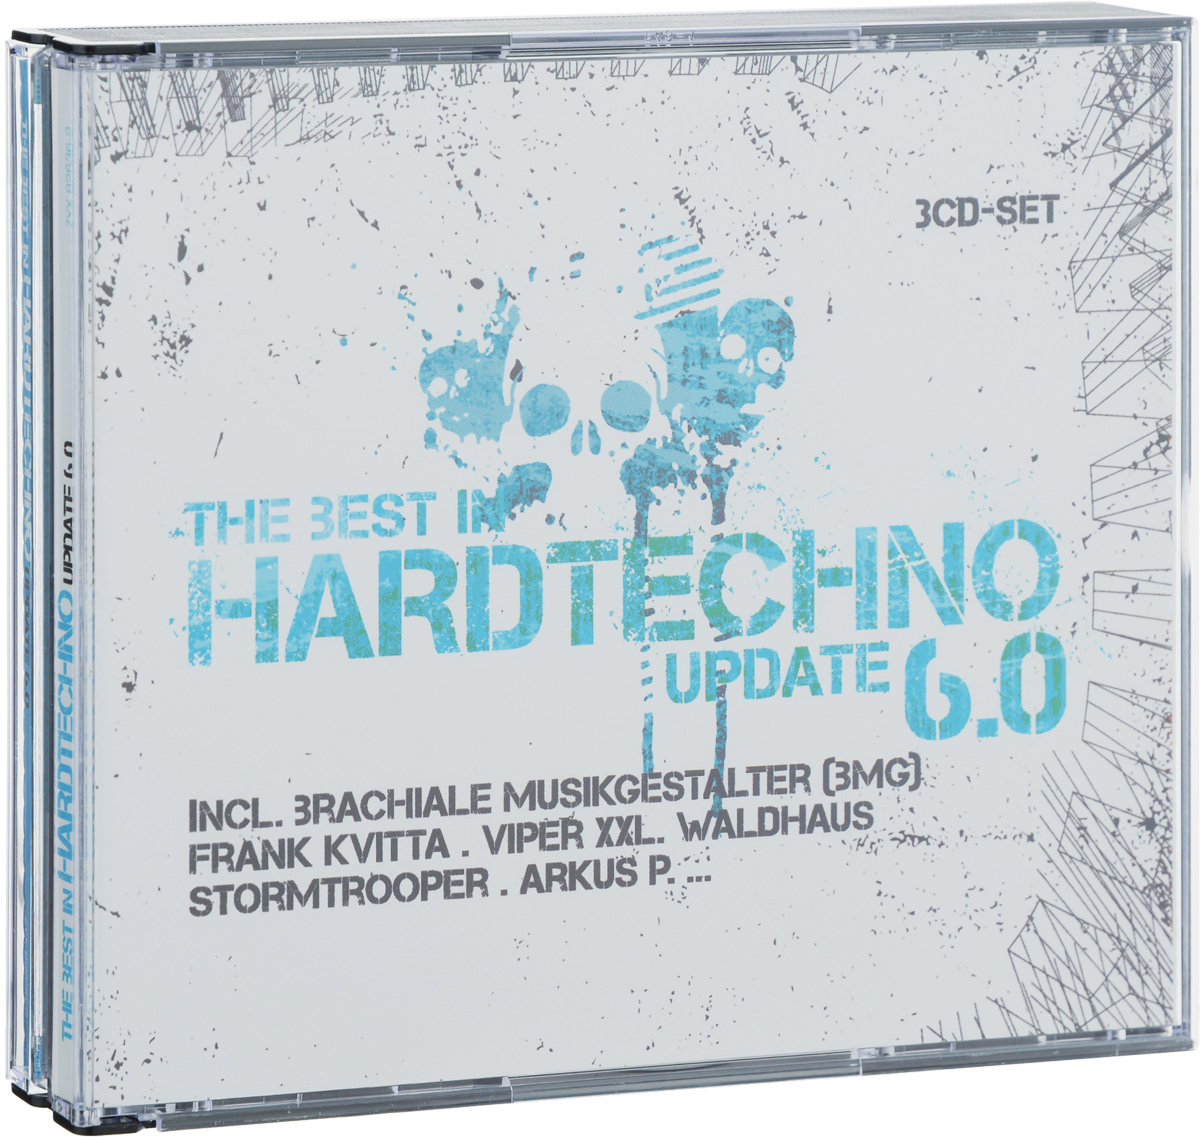 The Best In Hardtechno. Update 6.0 (3 CD)